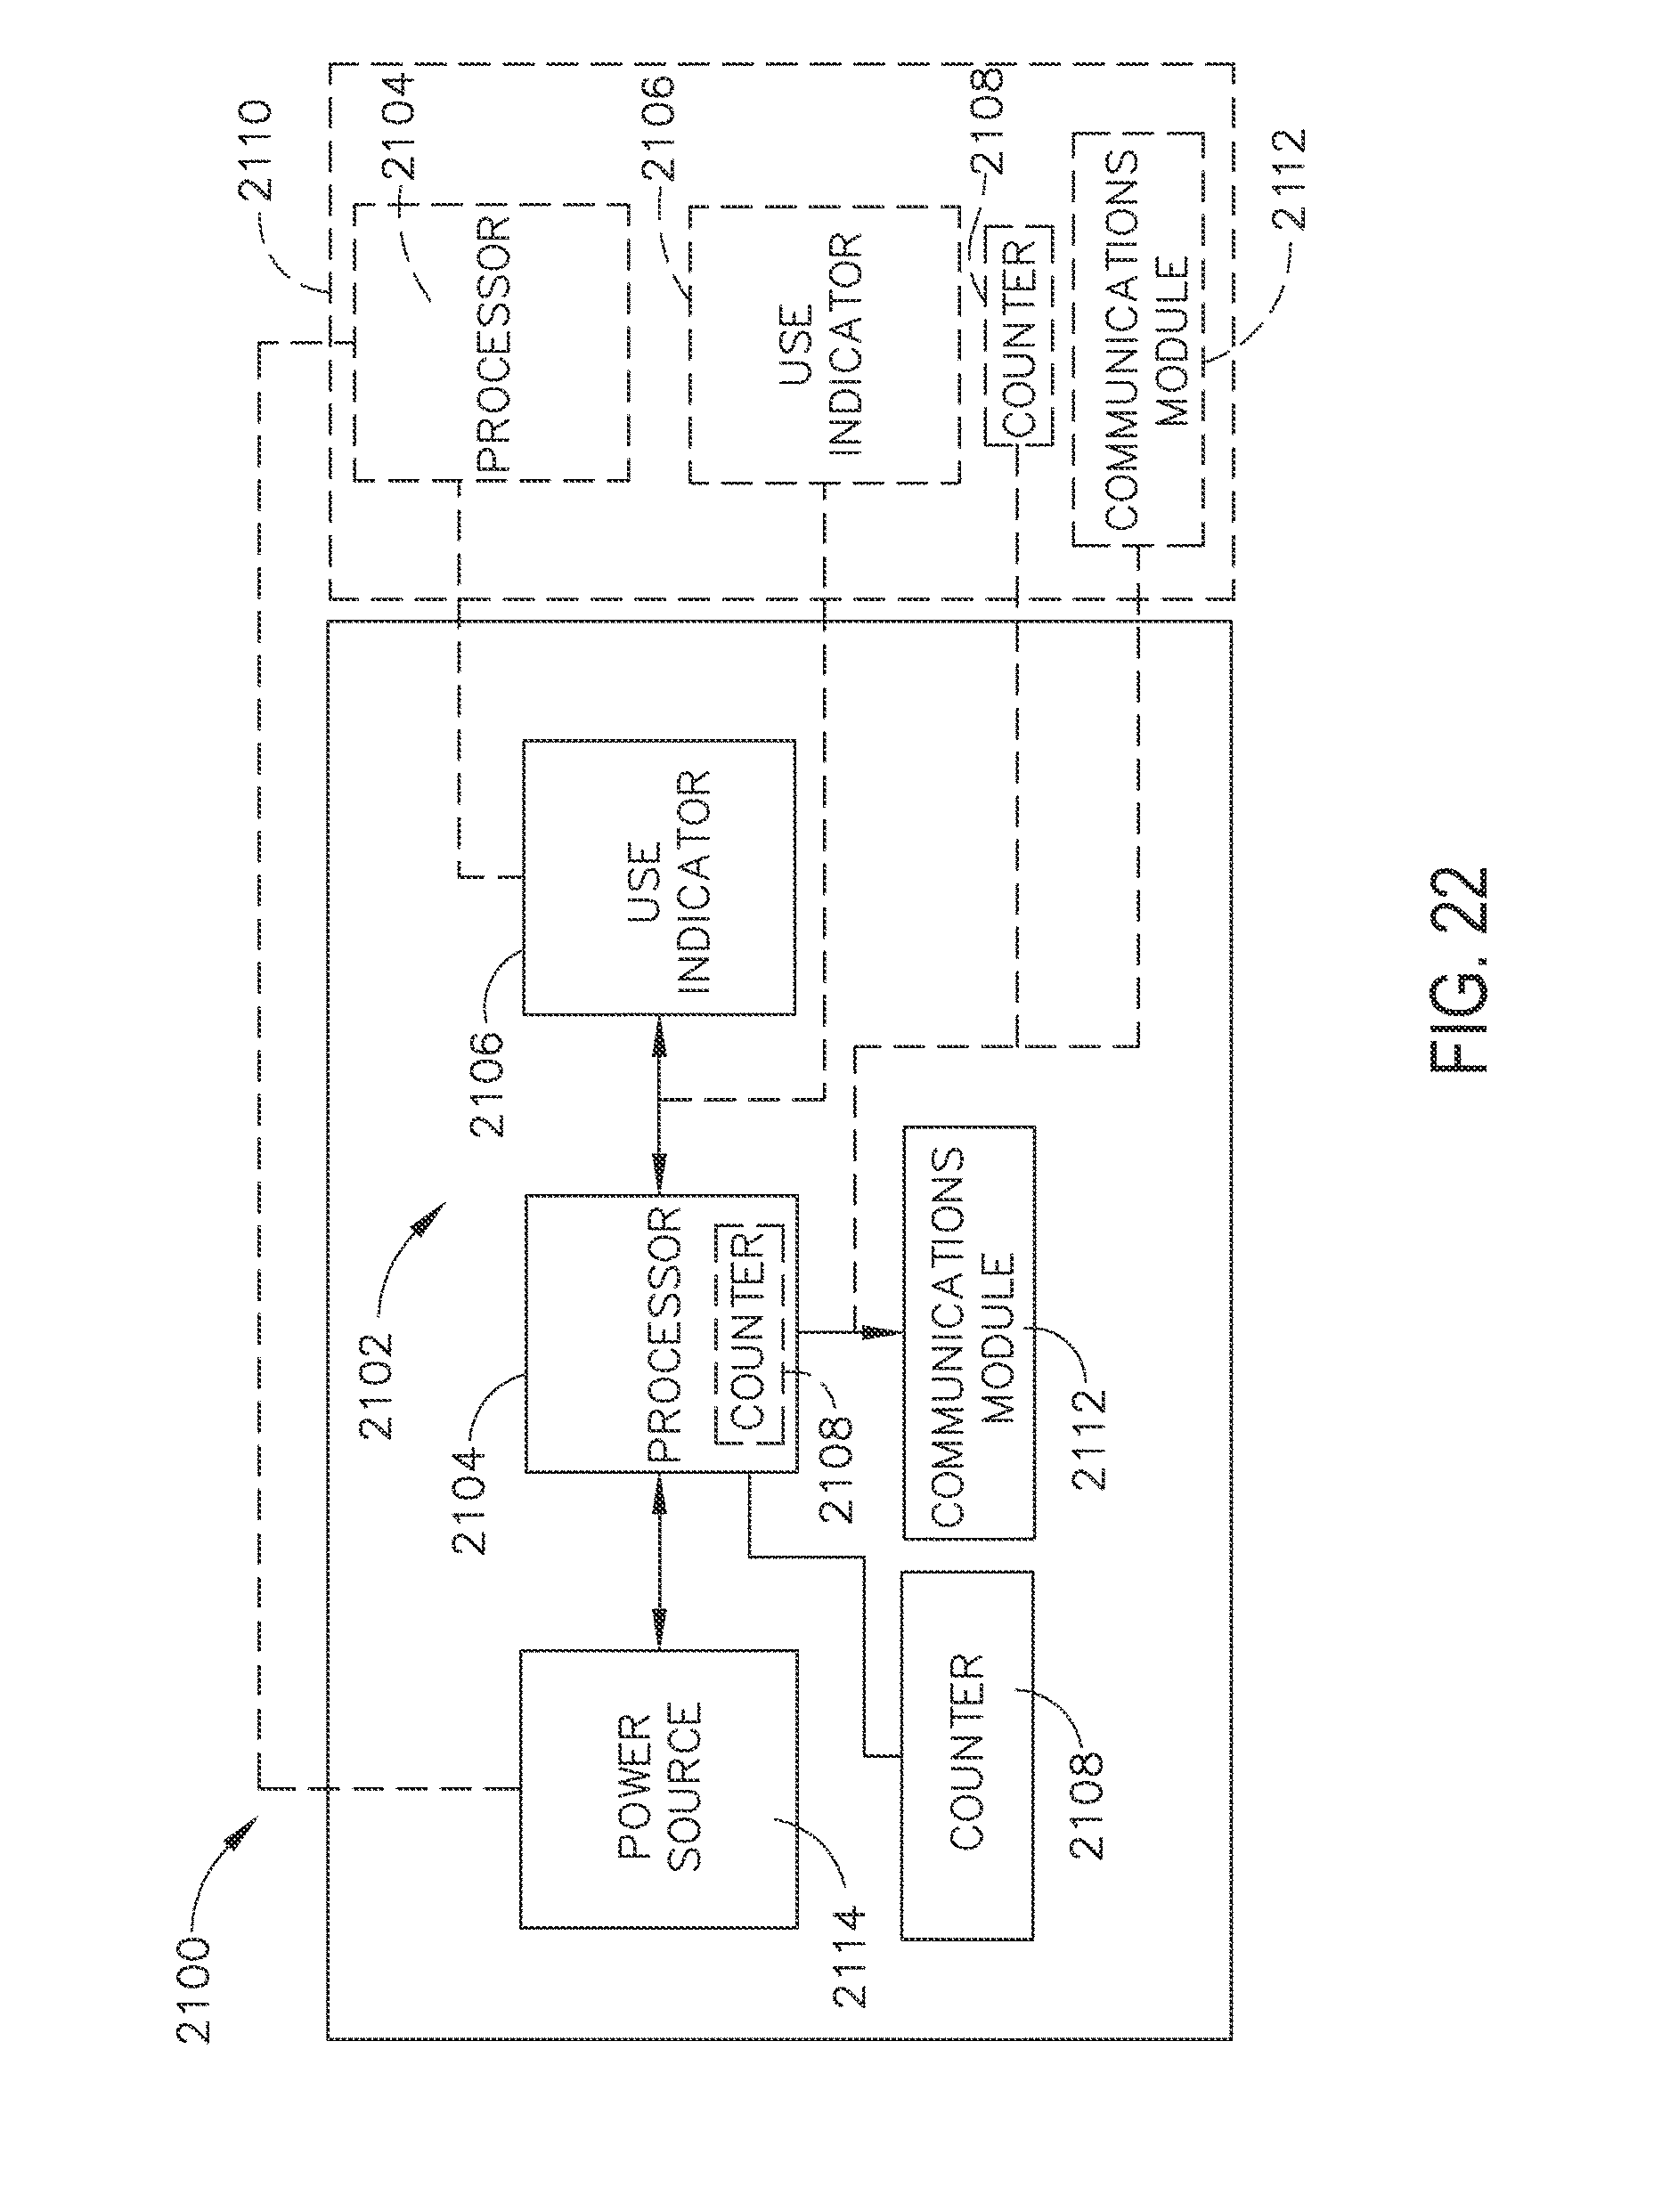 SMC 13622-9-N Manifold Base